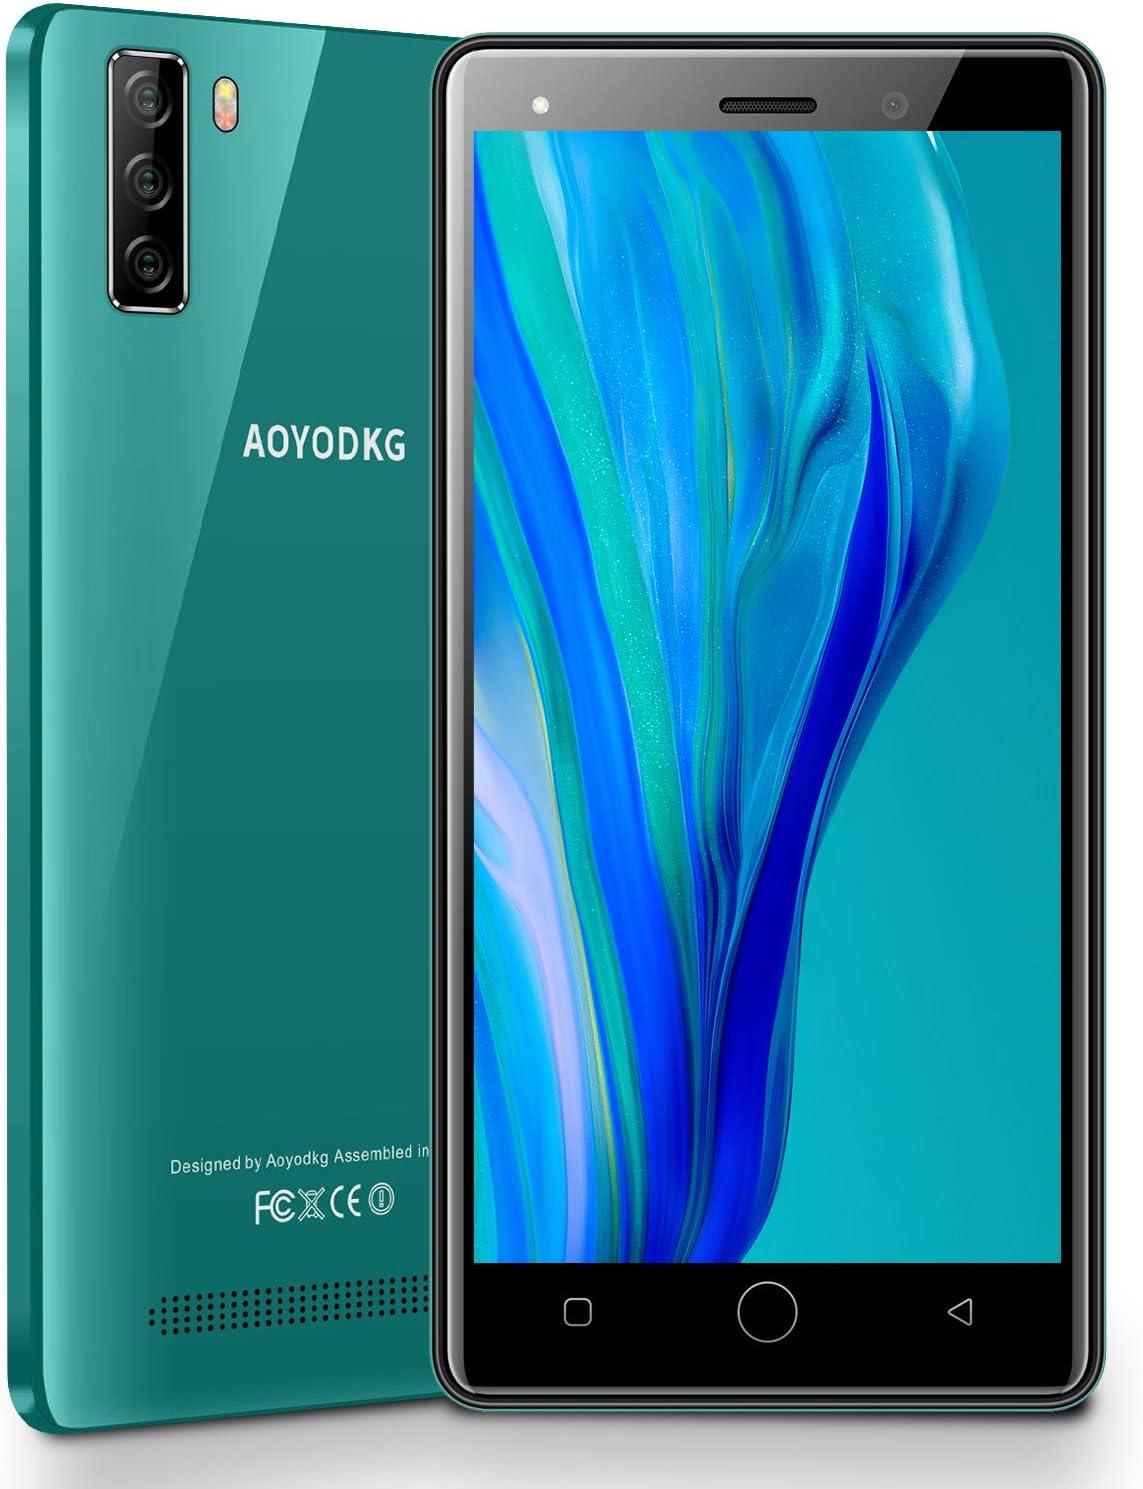 Moviles Libres 4G Android 9.0 Pie, A10+(2020) 1GB RAM+16GB ROM/128GB 5.0'' HD Smartphone Libre Quad-Core Dual SIM Dual Cámara 8MP+5MP 2800mAh GPS Bluetooth Moviles Buenos (Verde)